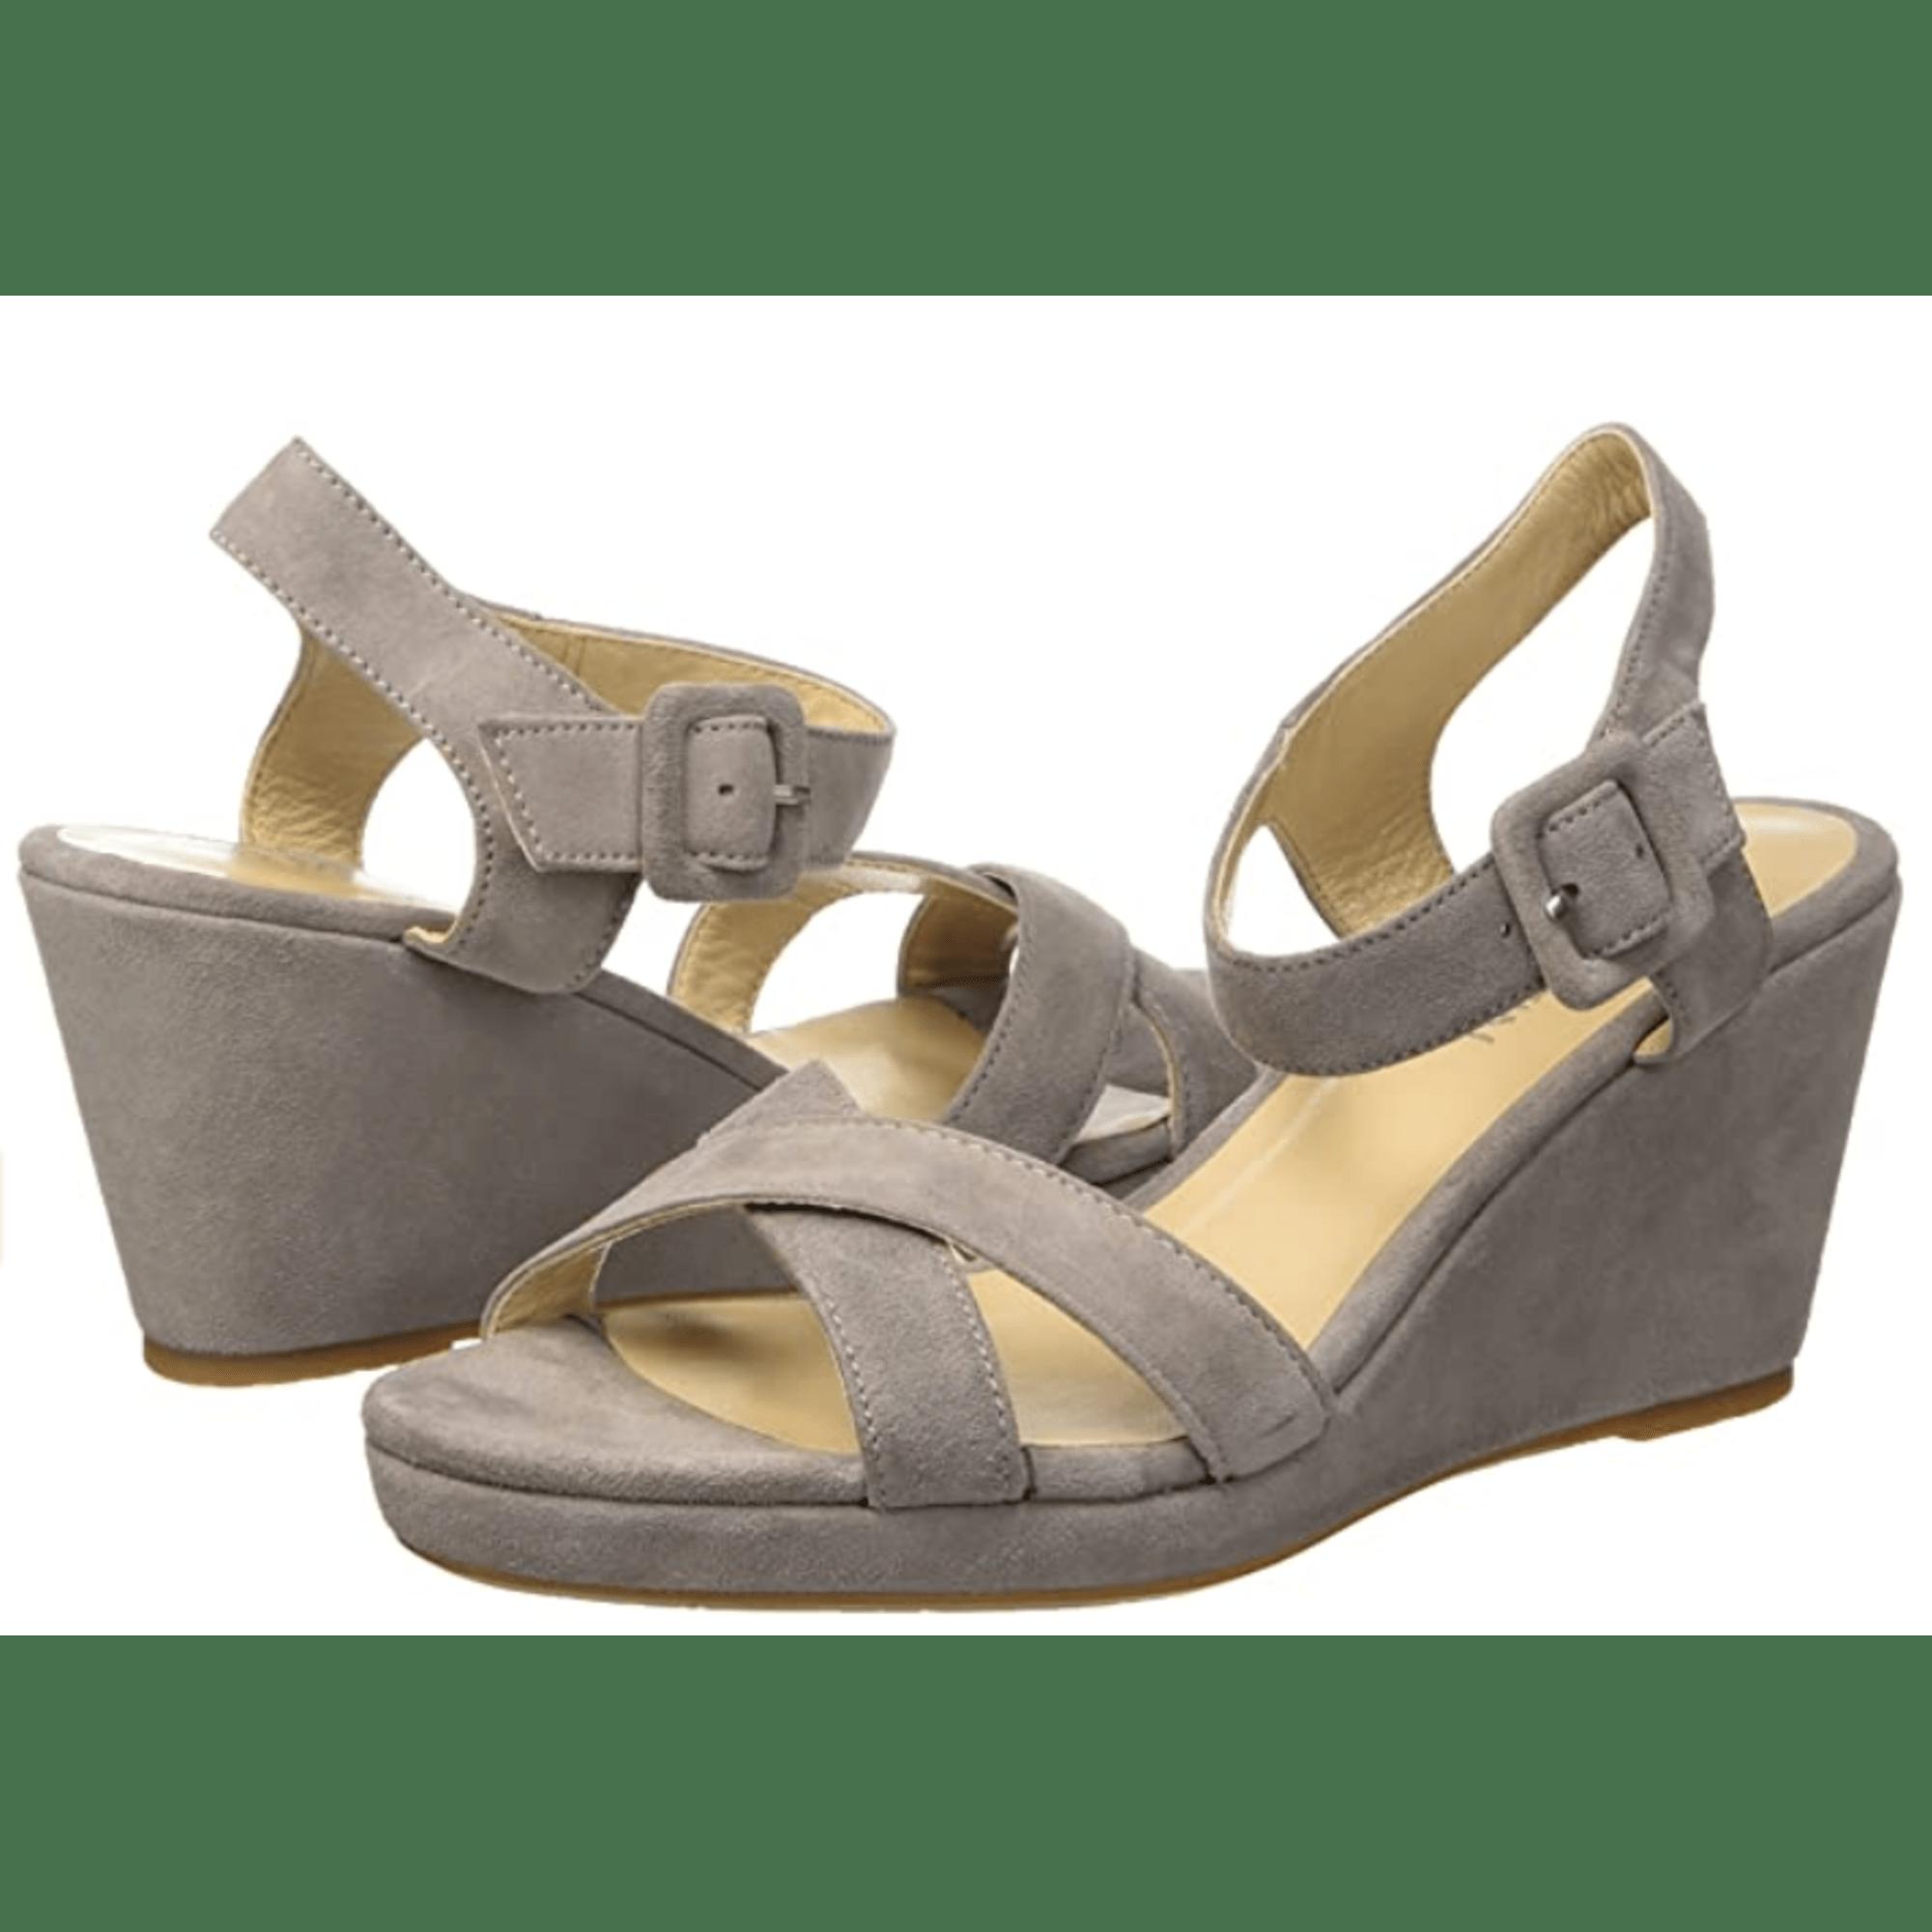 Sandales compensées JB MARTIN Gris, anthracite